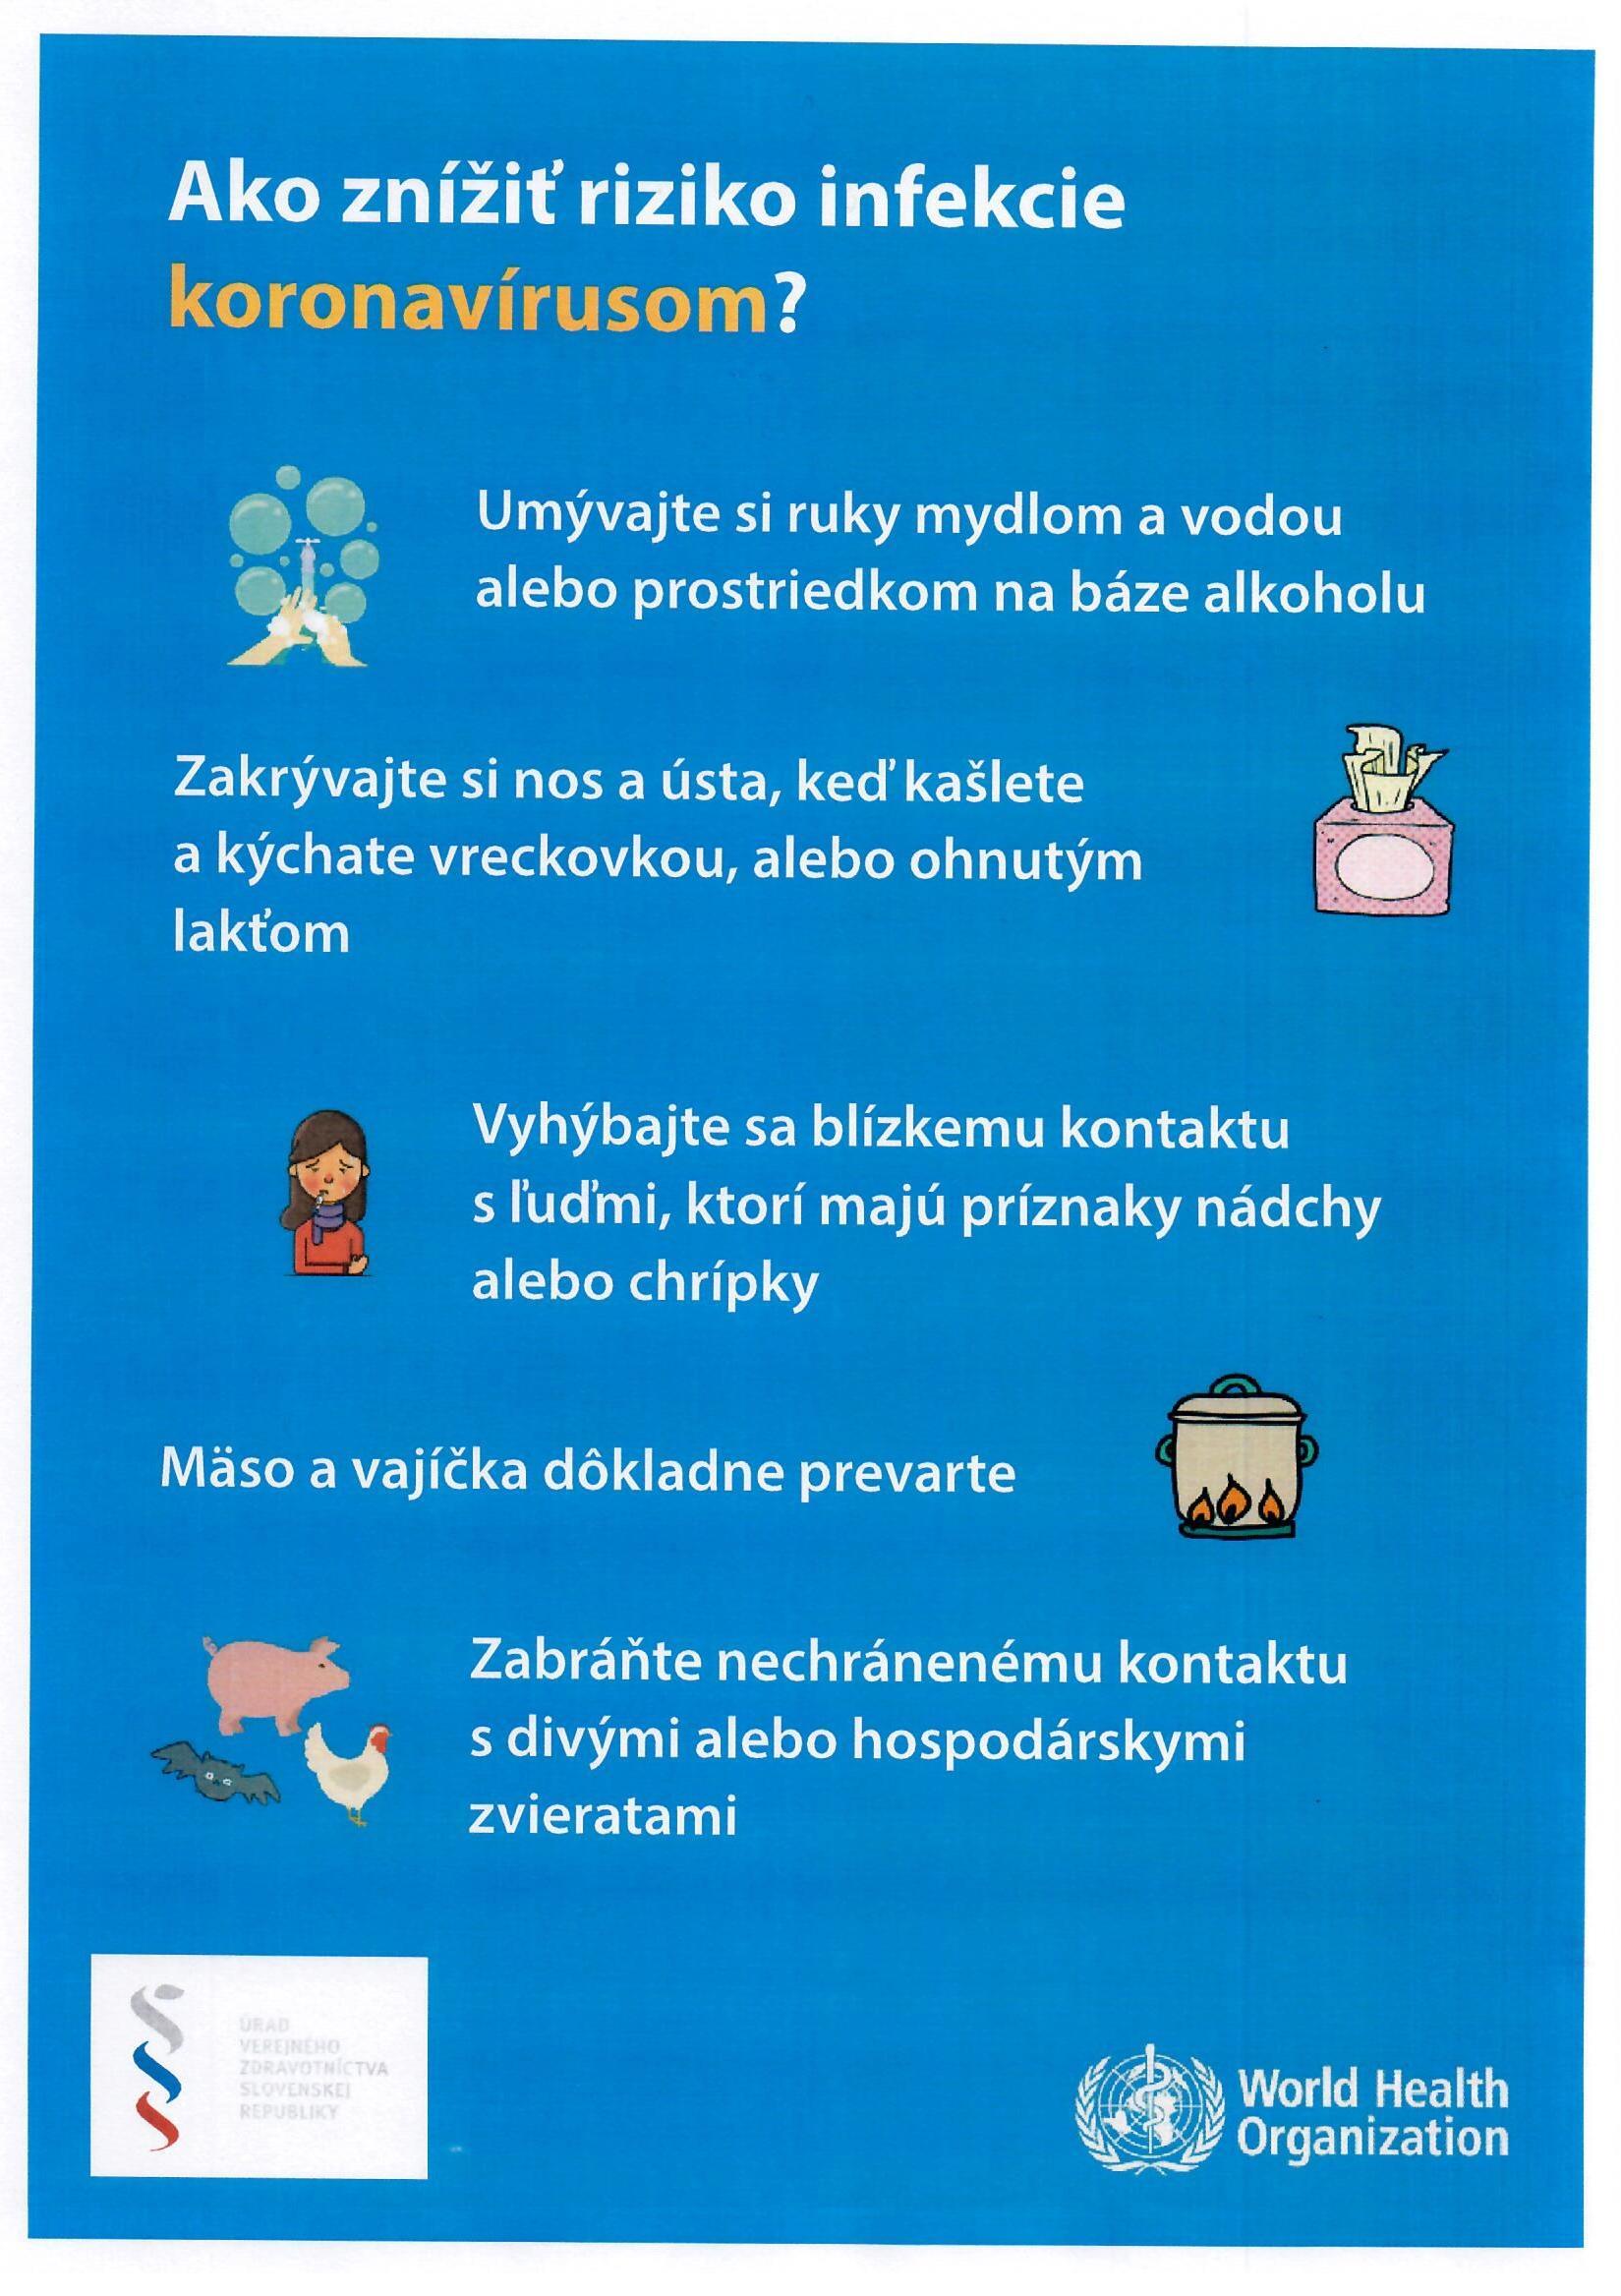 Információs anyag - KORONAVÍRUS - Informačný materiál 4